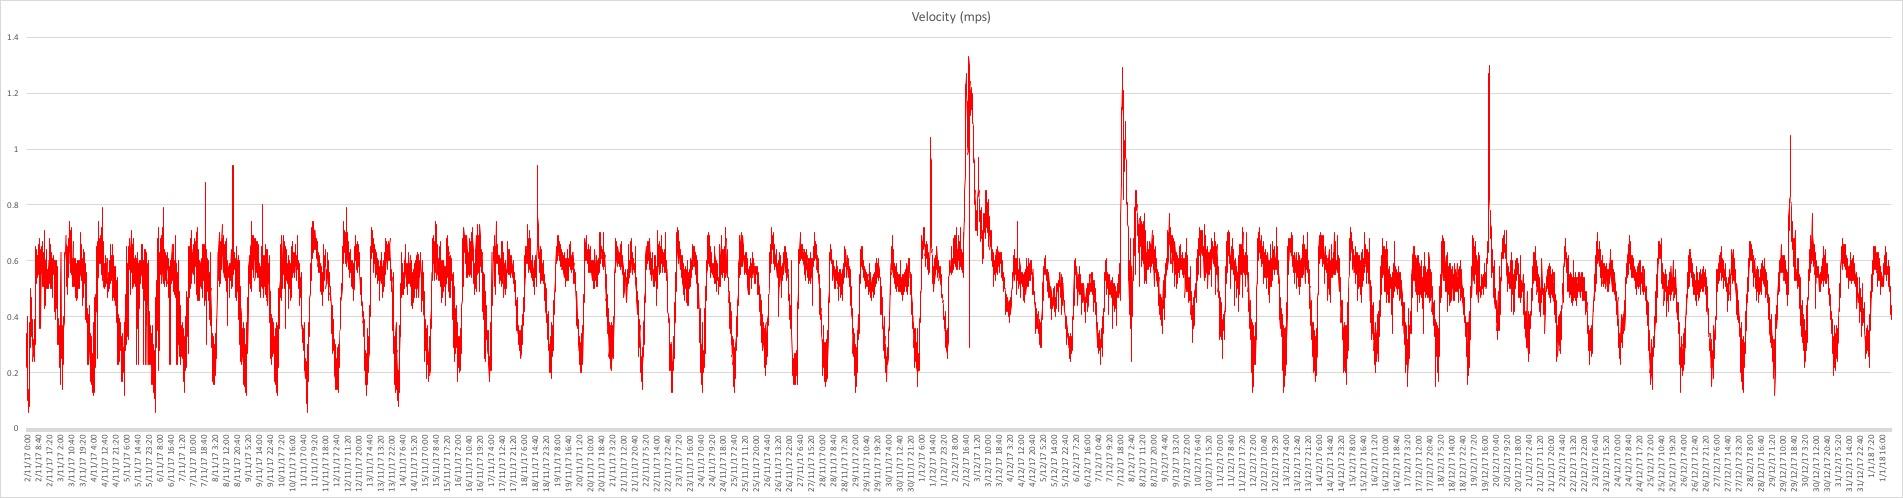 EC01 Velocity.jpg